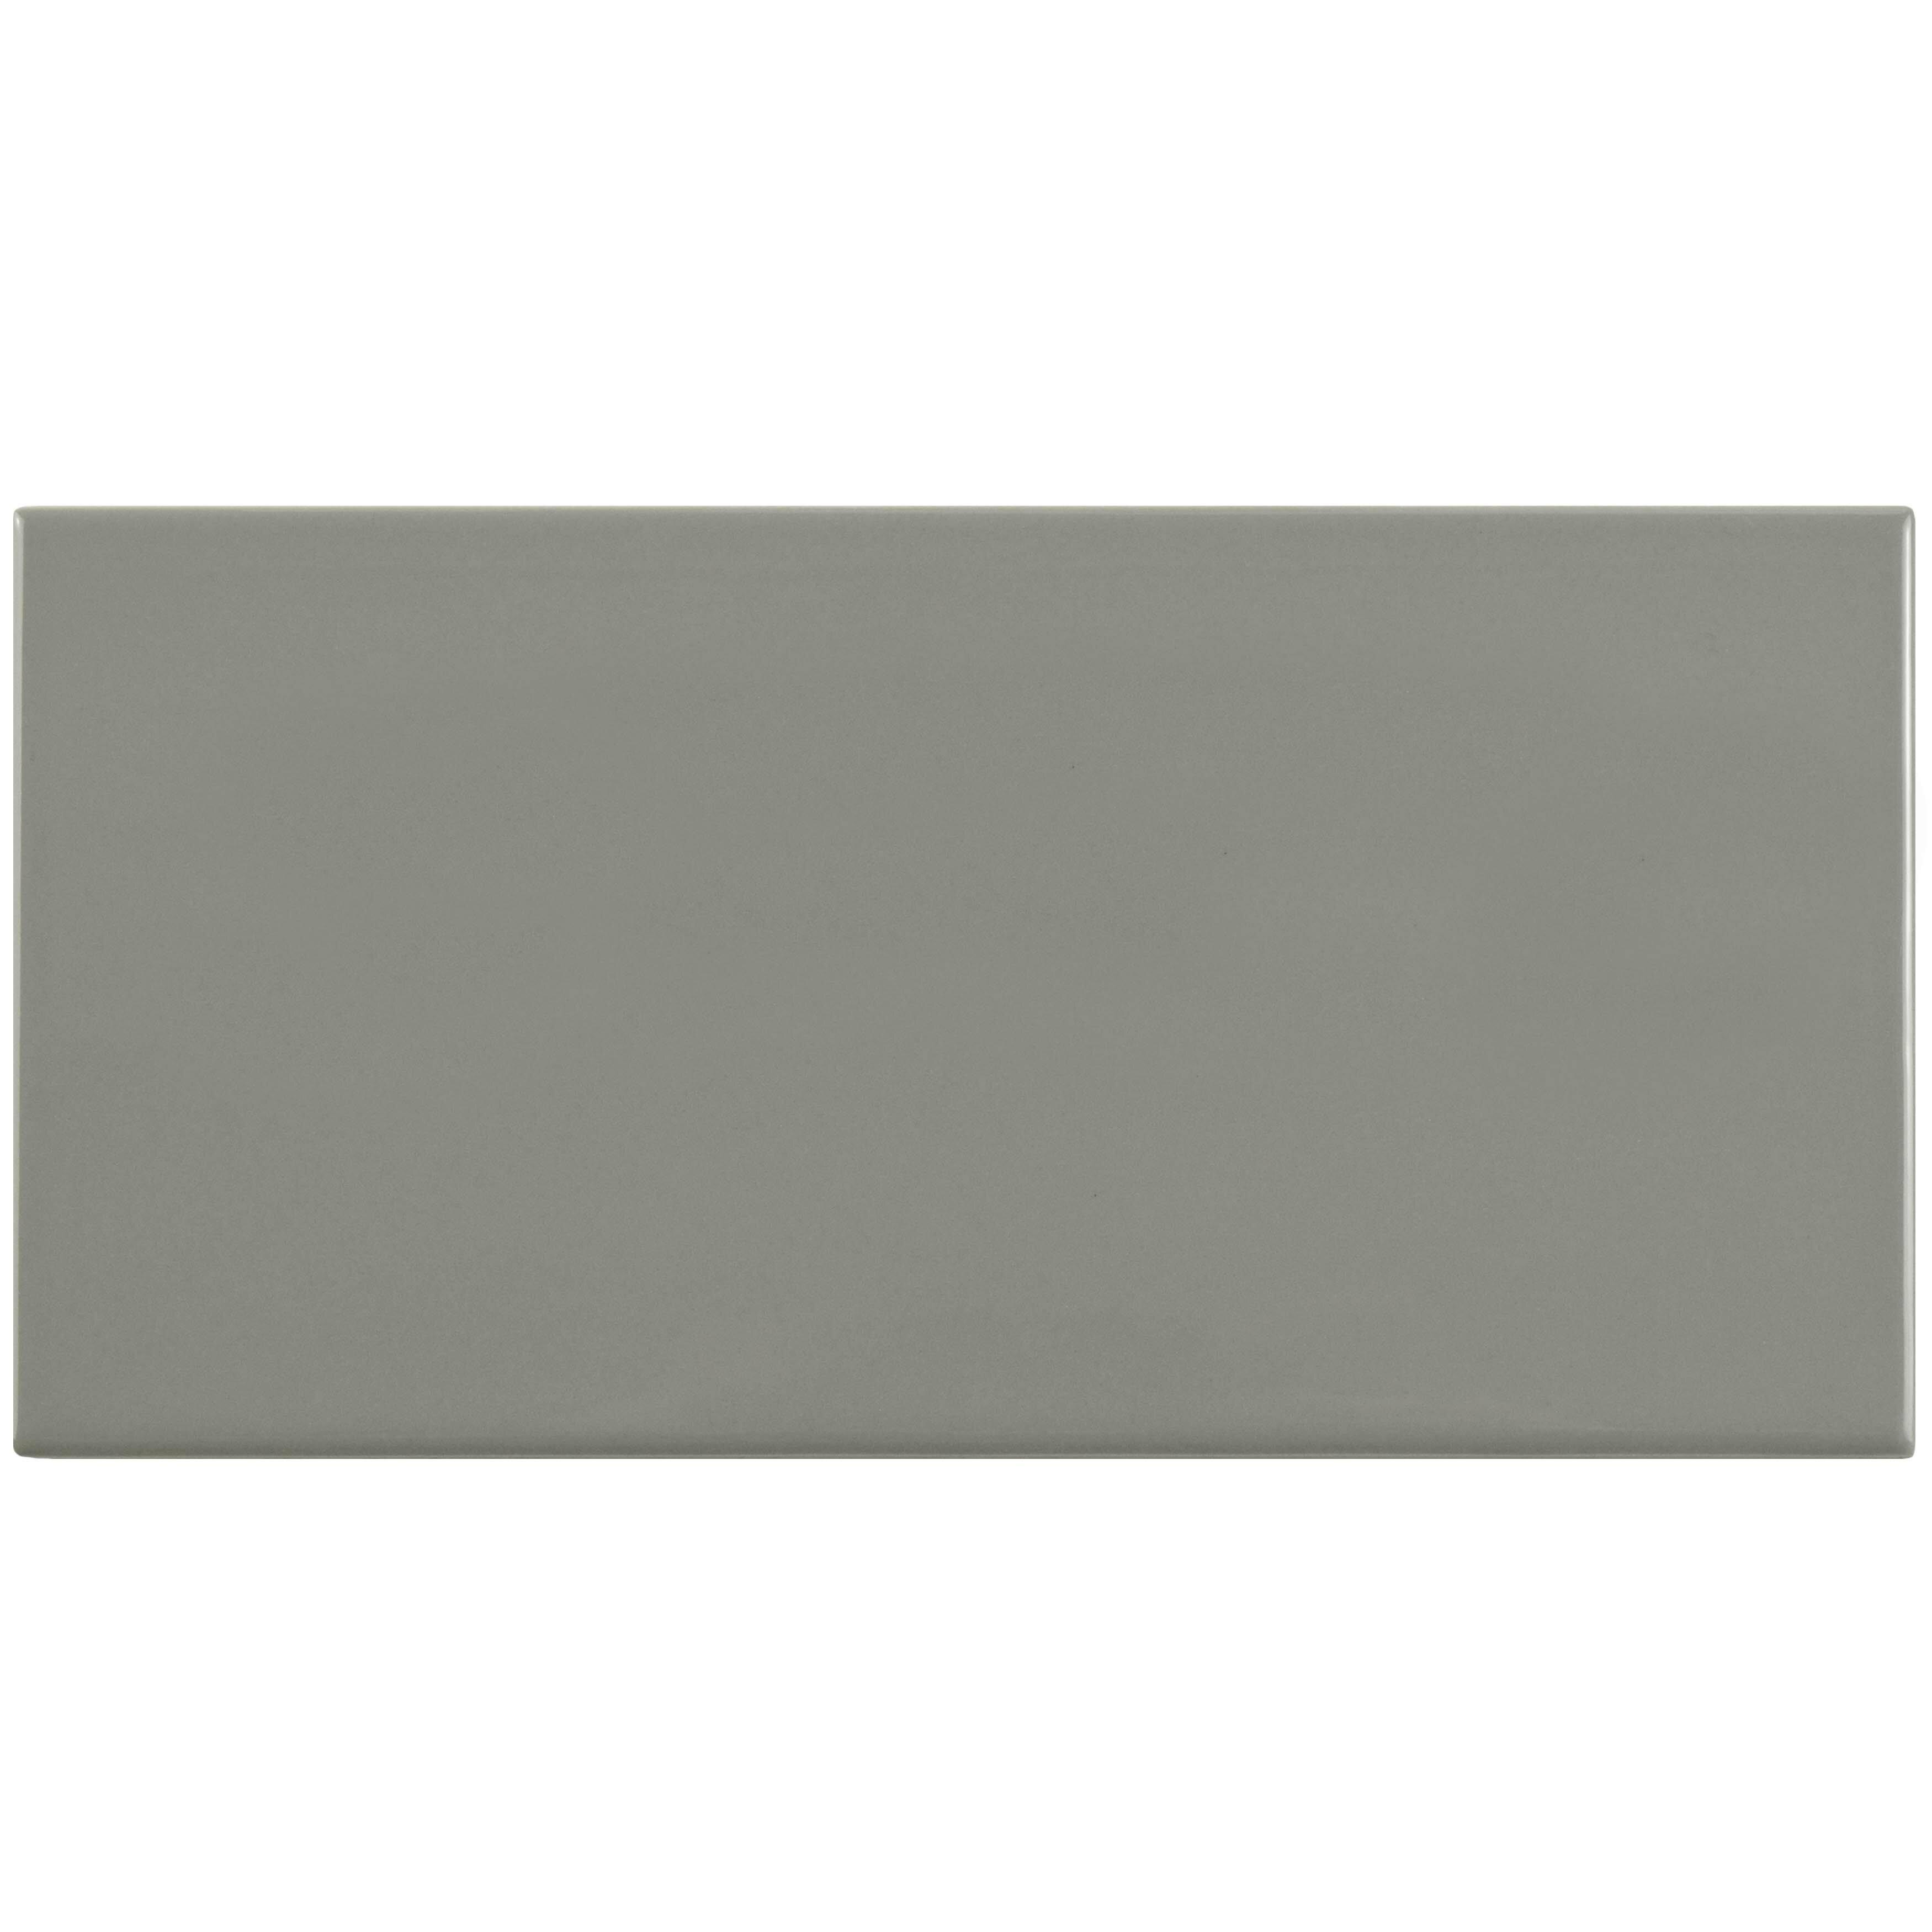 Elitetile prospect 3 x 6 ceramic subway tile in gray reviews elitetile prospect 3 x 6 ceramic subway tile in gray reviews wayfair dailygadgetfo Gallery